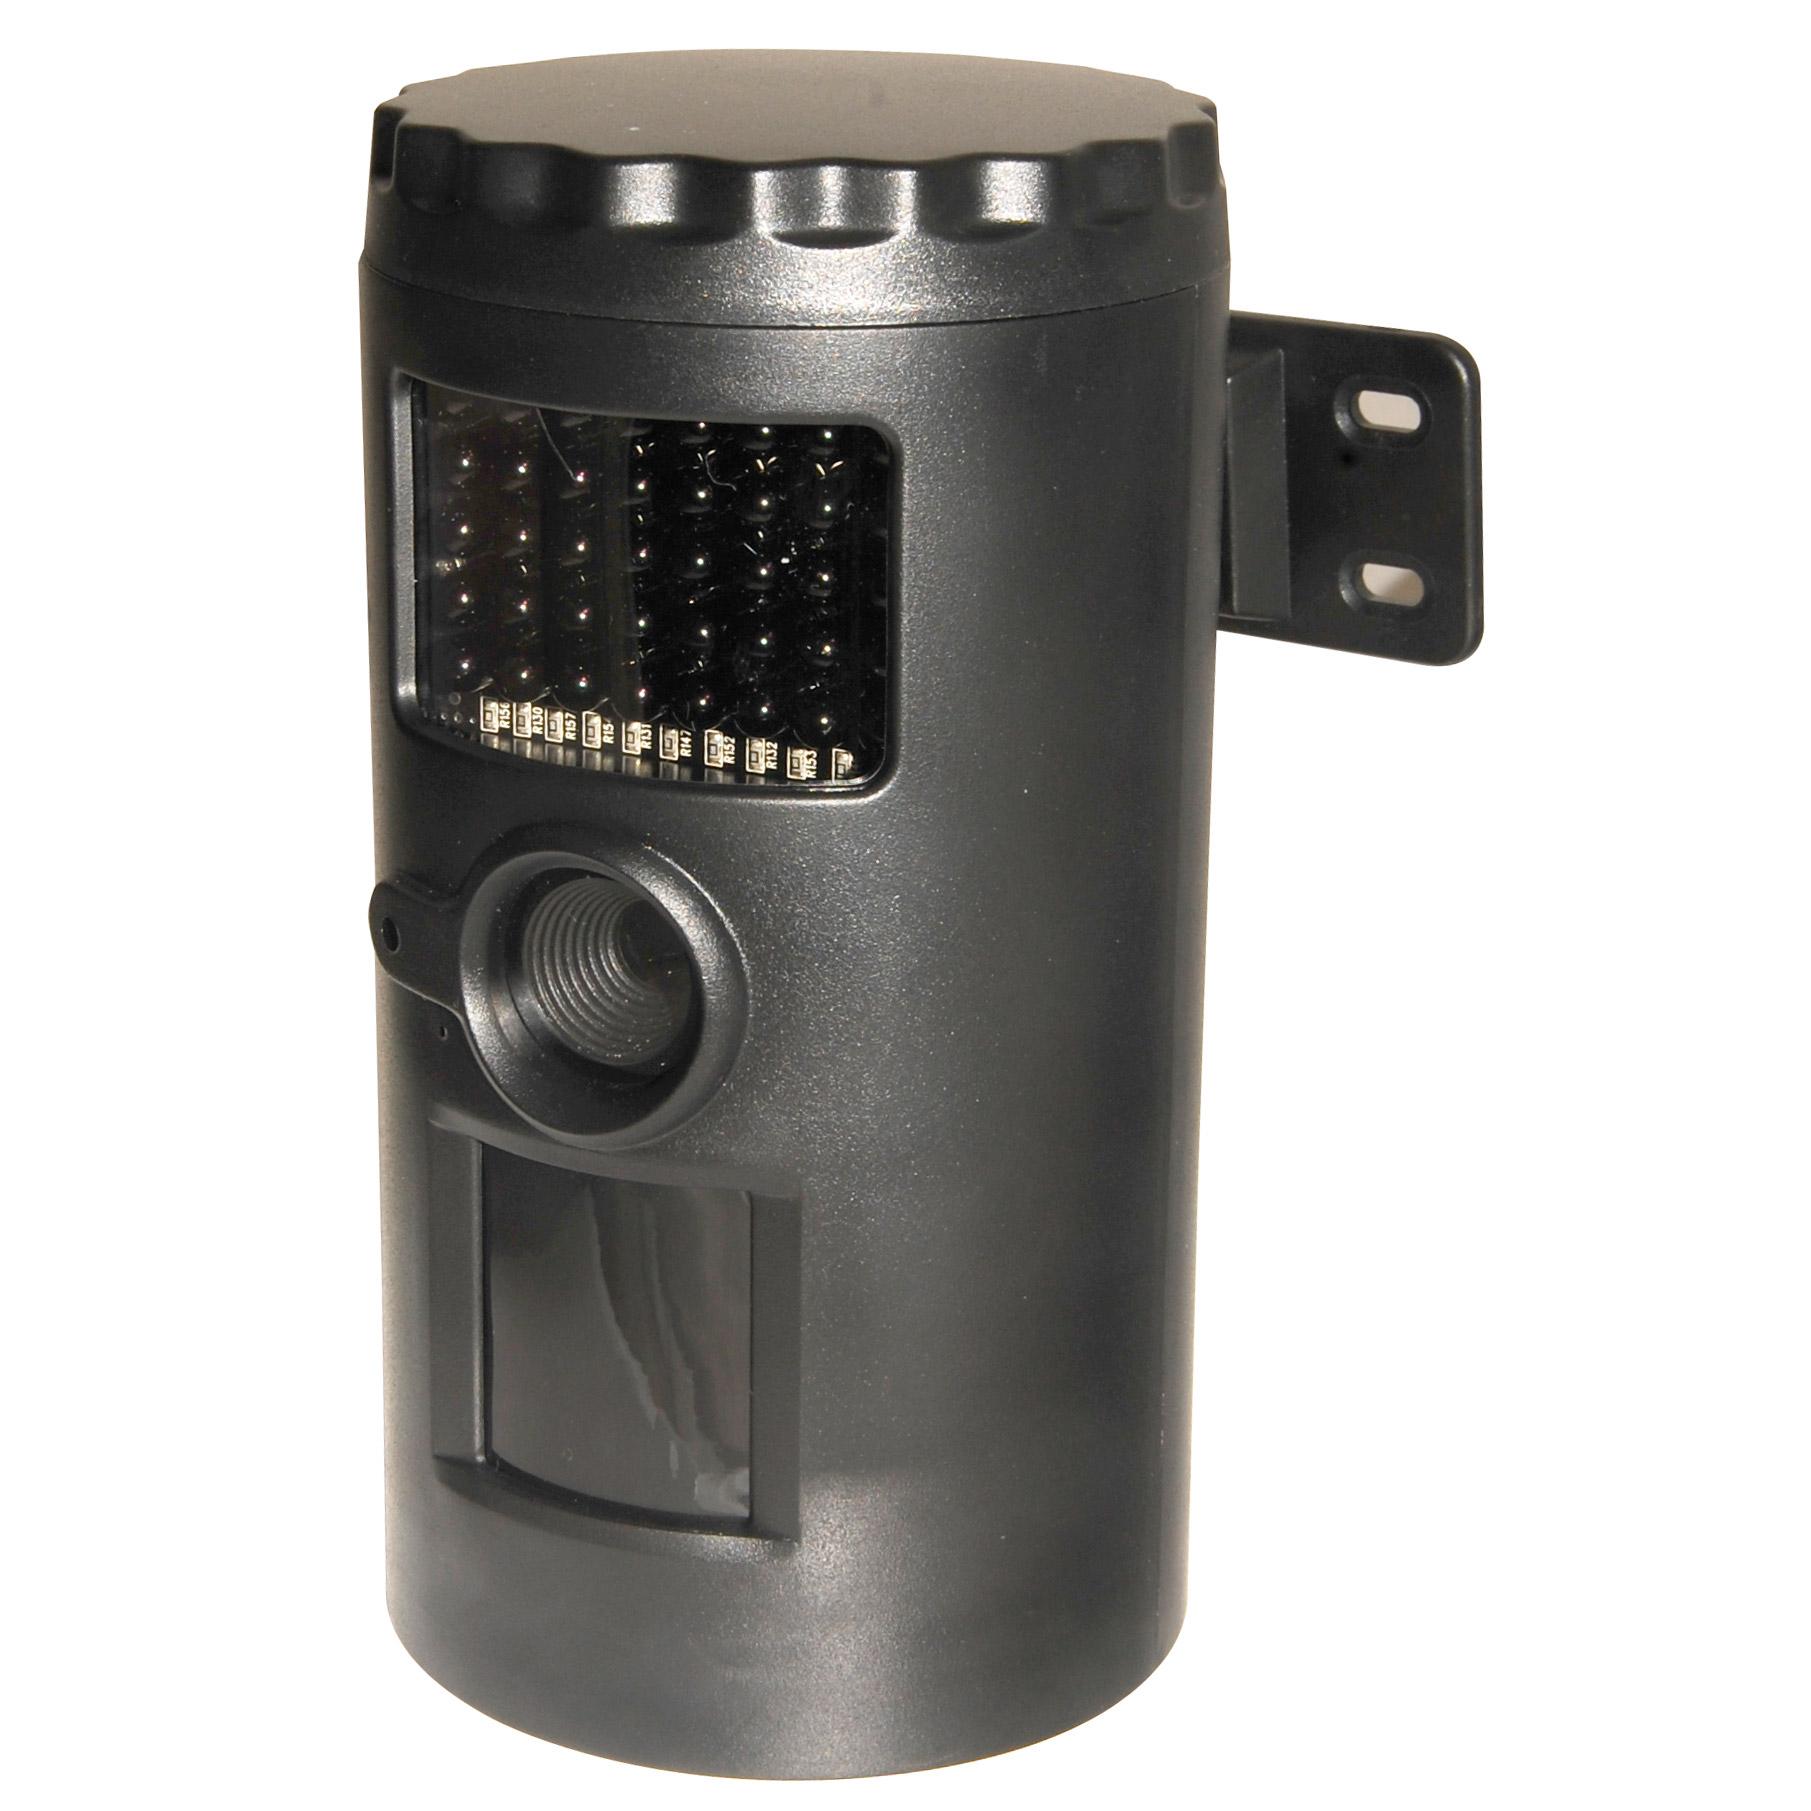 Cancam Stand Alone External Surveillance System